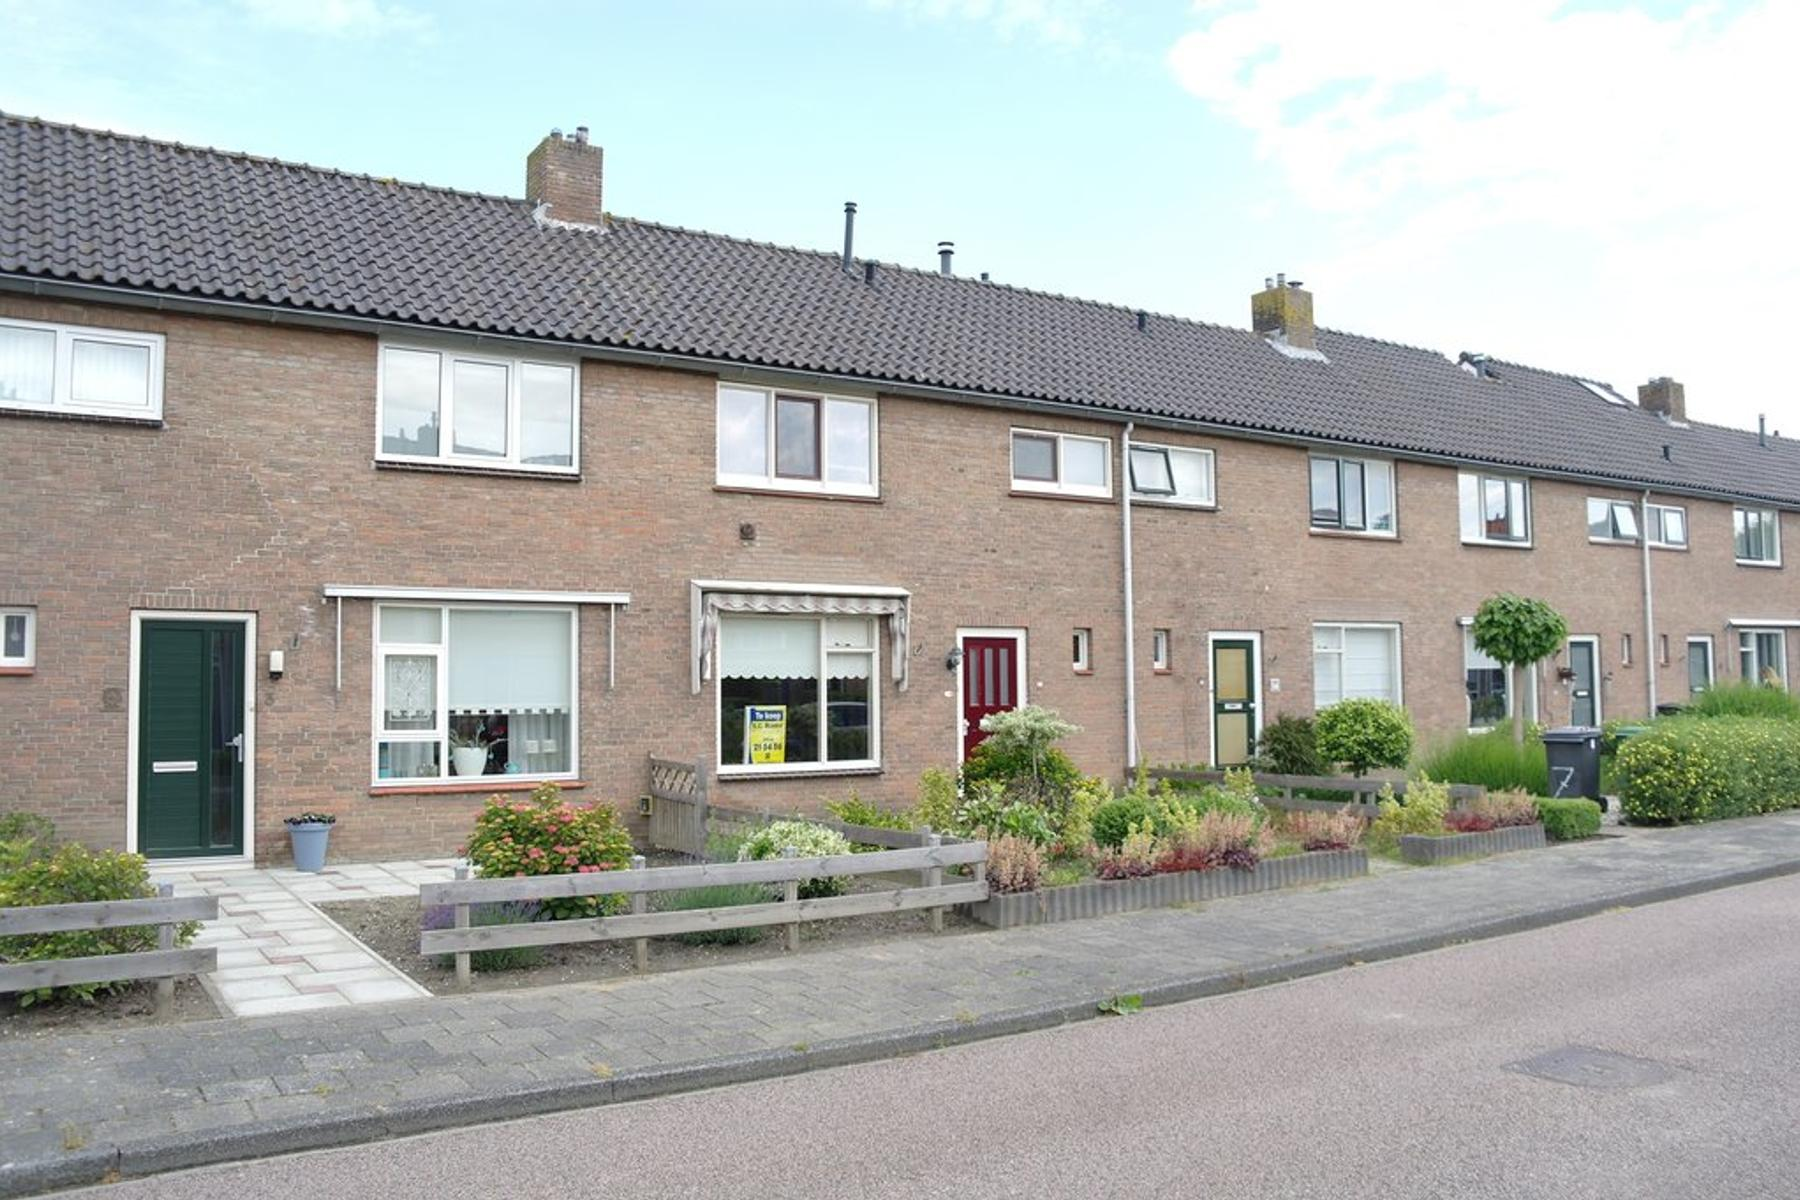 Dr. Colijnstraat 5 in Middenmeer 1775 CG